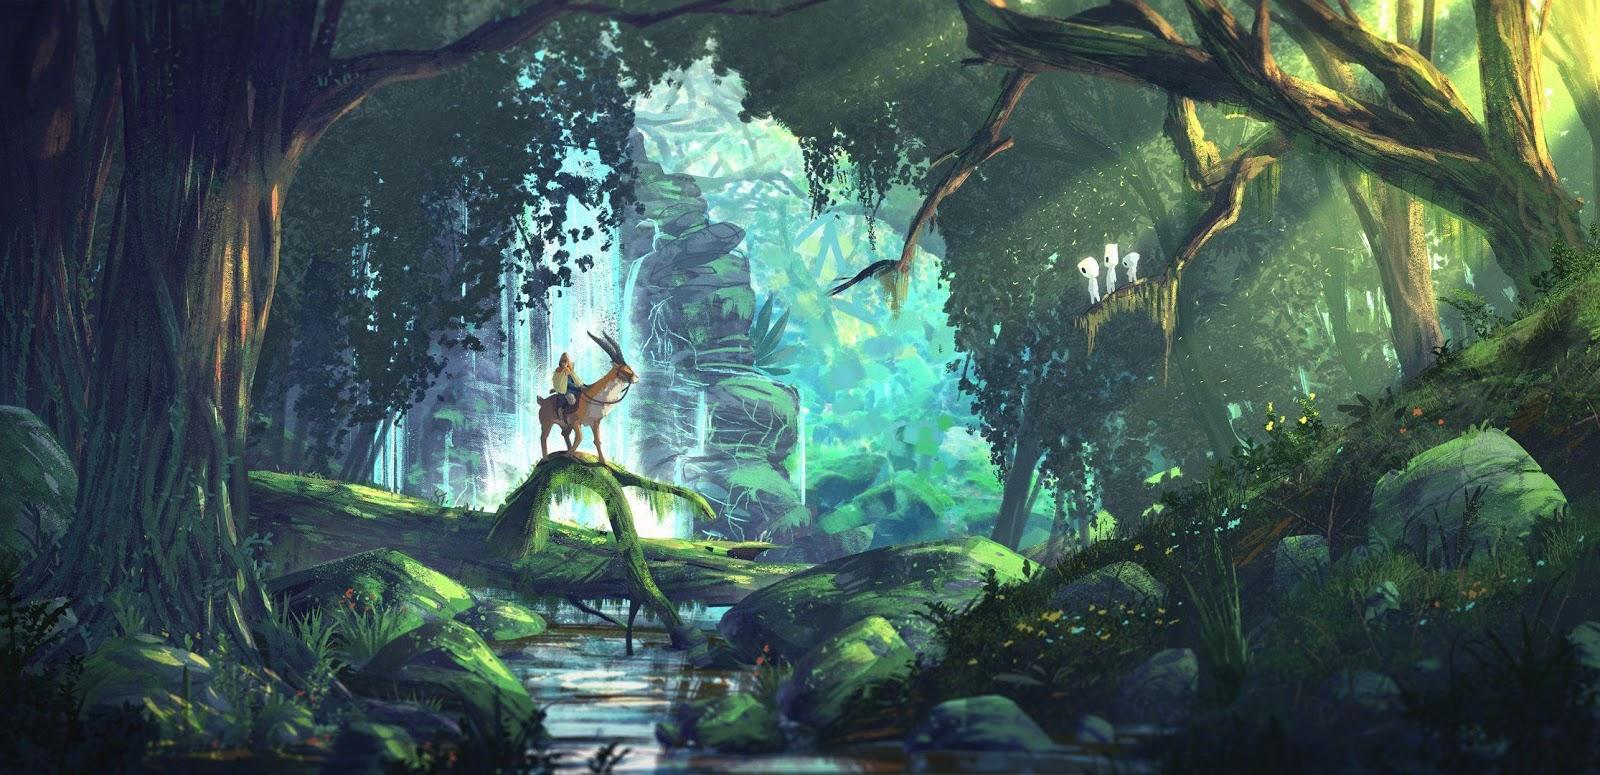 Ashitaka in the Spirit Forest  hd wallpaper